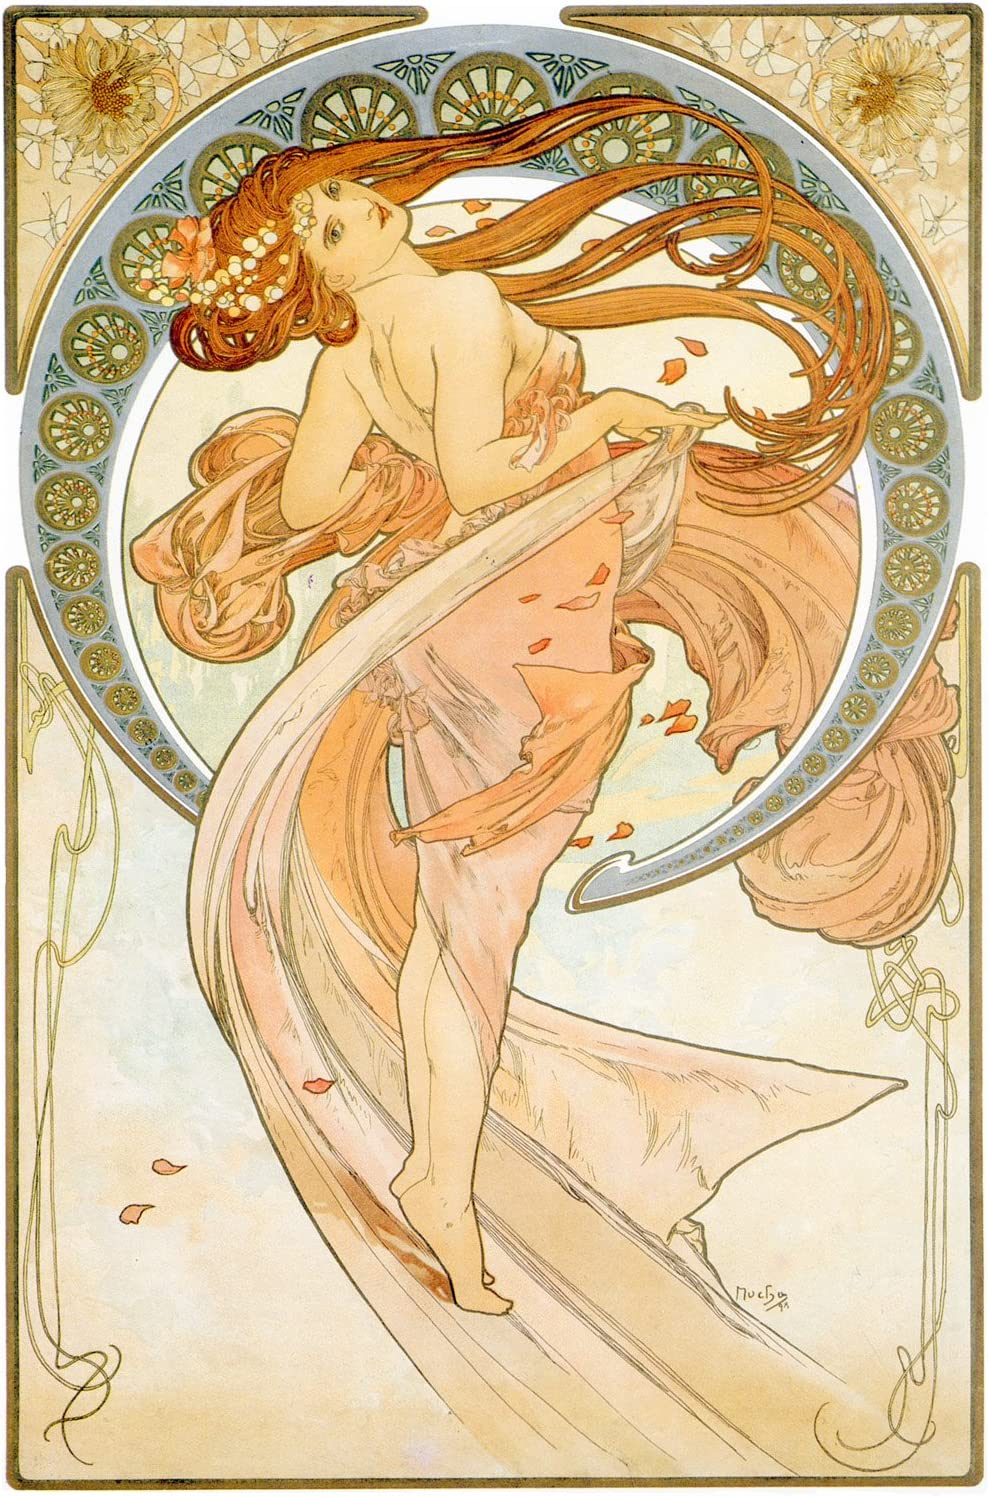 Alphonse Mucha Art Nouveau Vintage Poster Picture Print Wall Art New